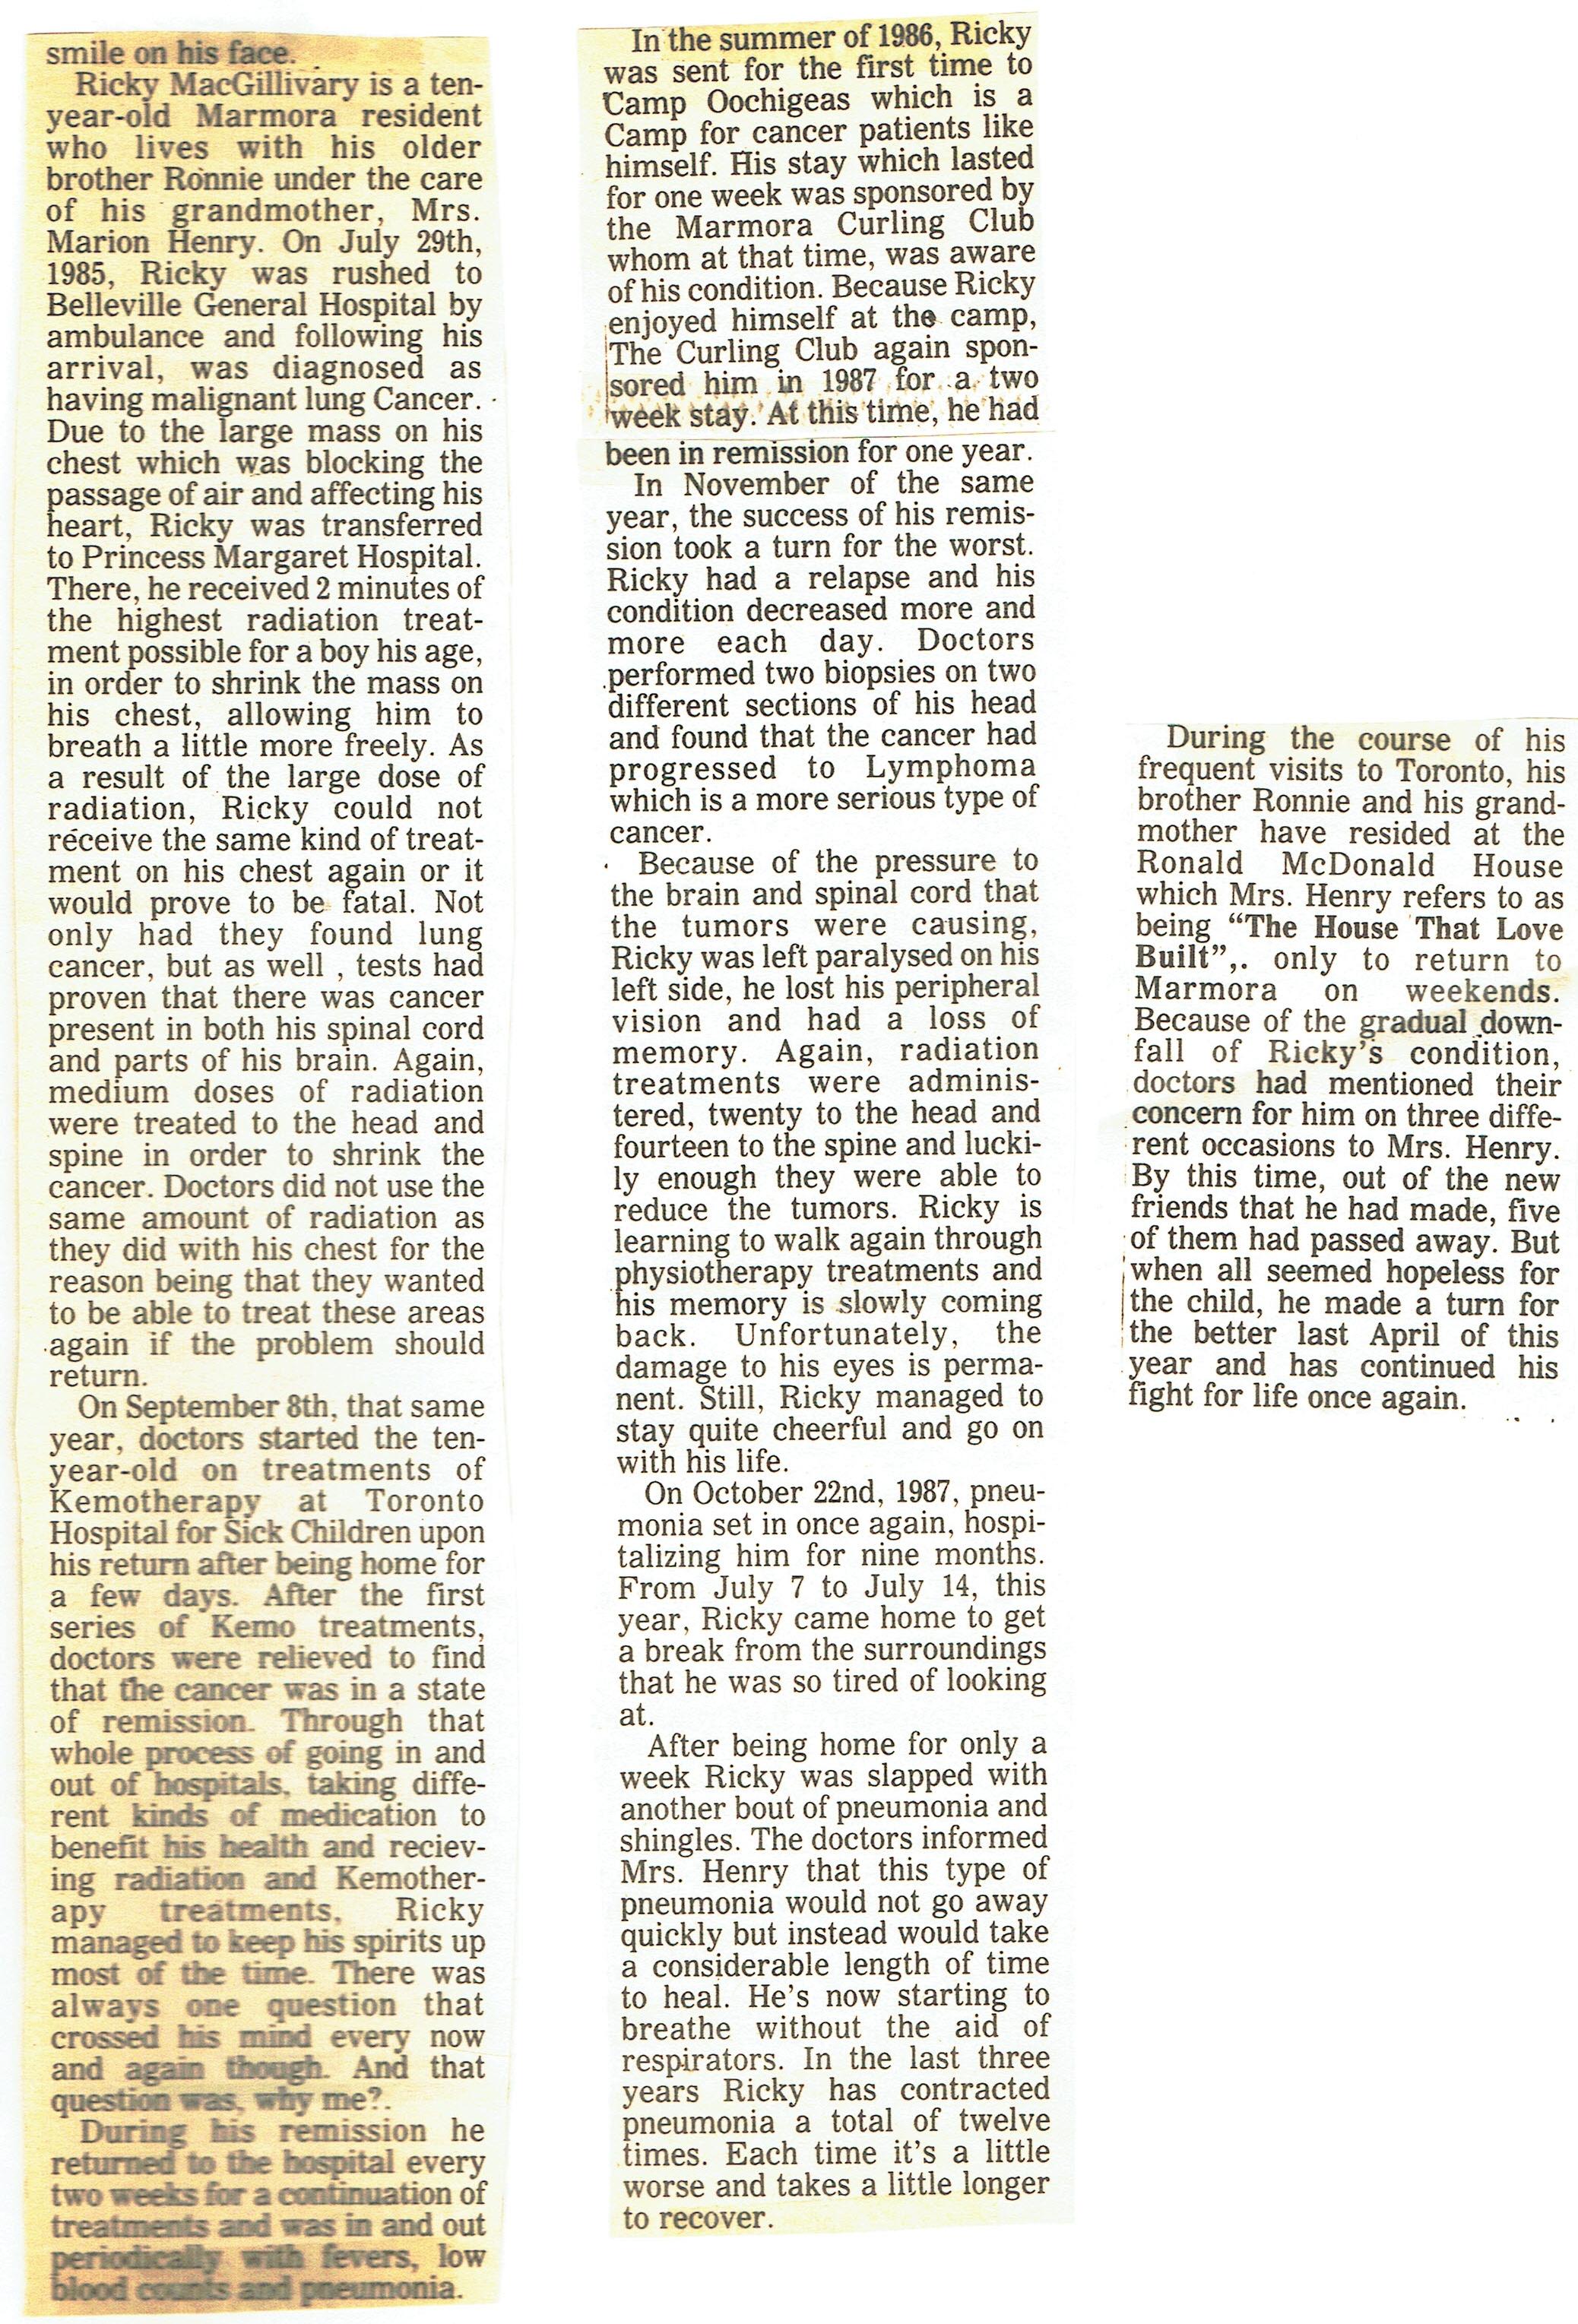 Ricky MacGillvary 1988 article.jpg